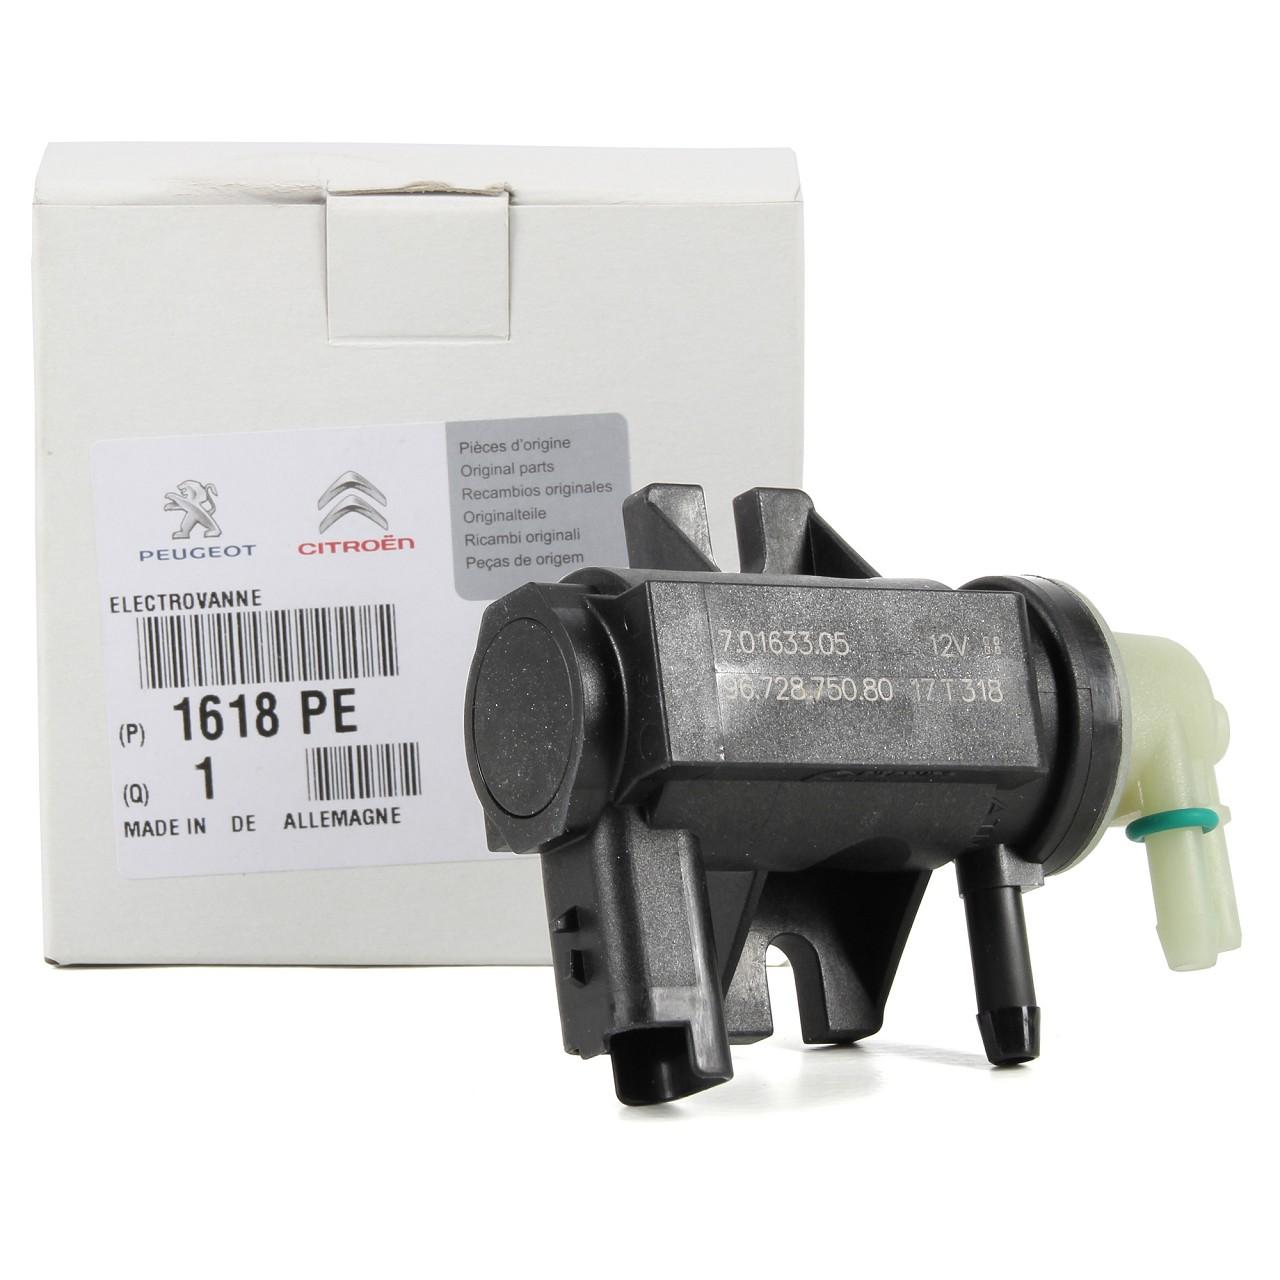 ORIGINAL Citroen Peugeot Druckwandler Magnetventil Turbolader 1.6 HDi 1618.PE